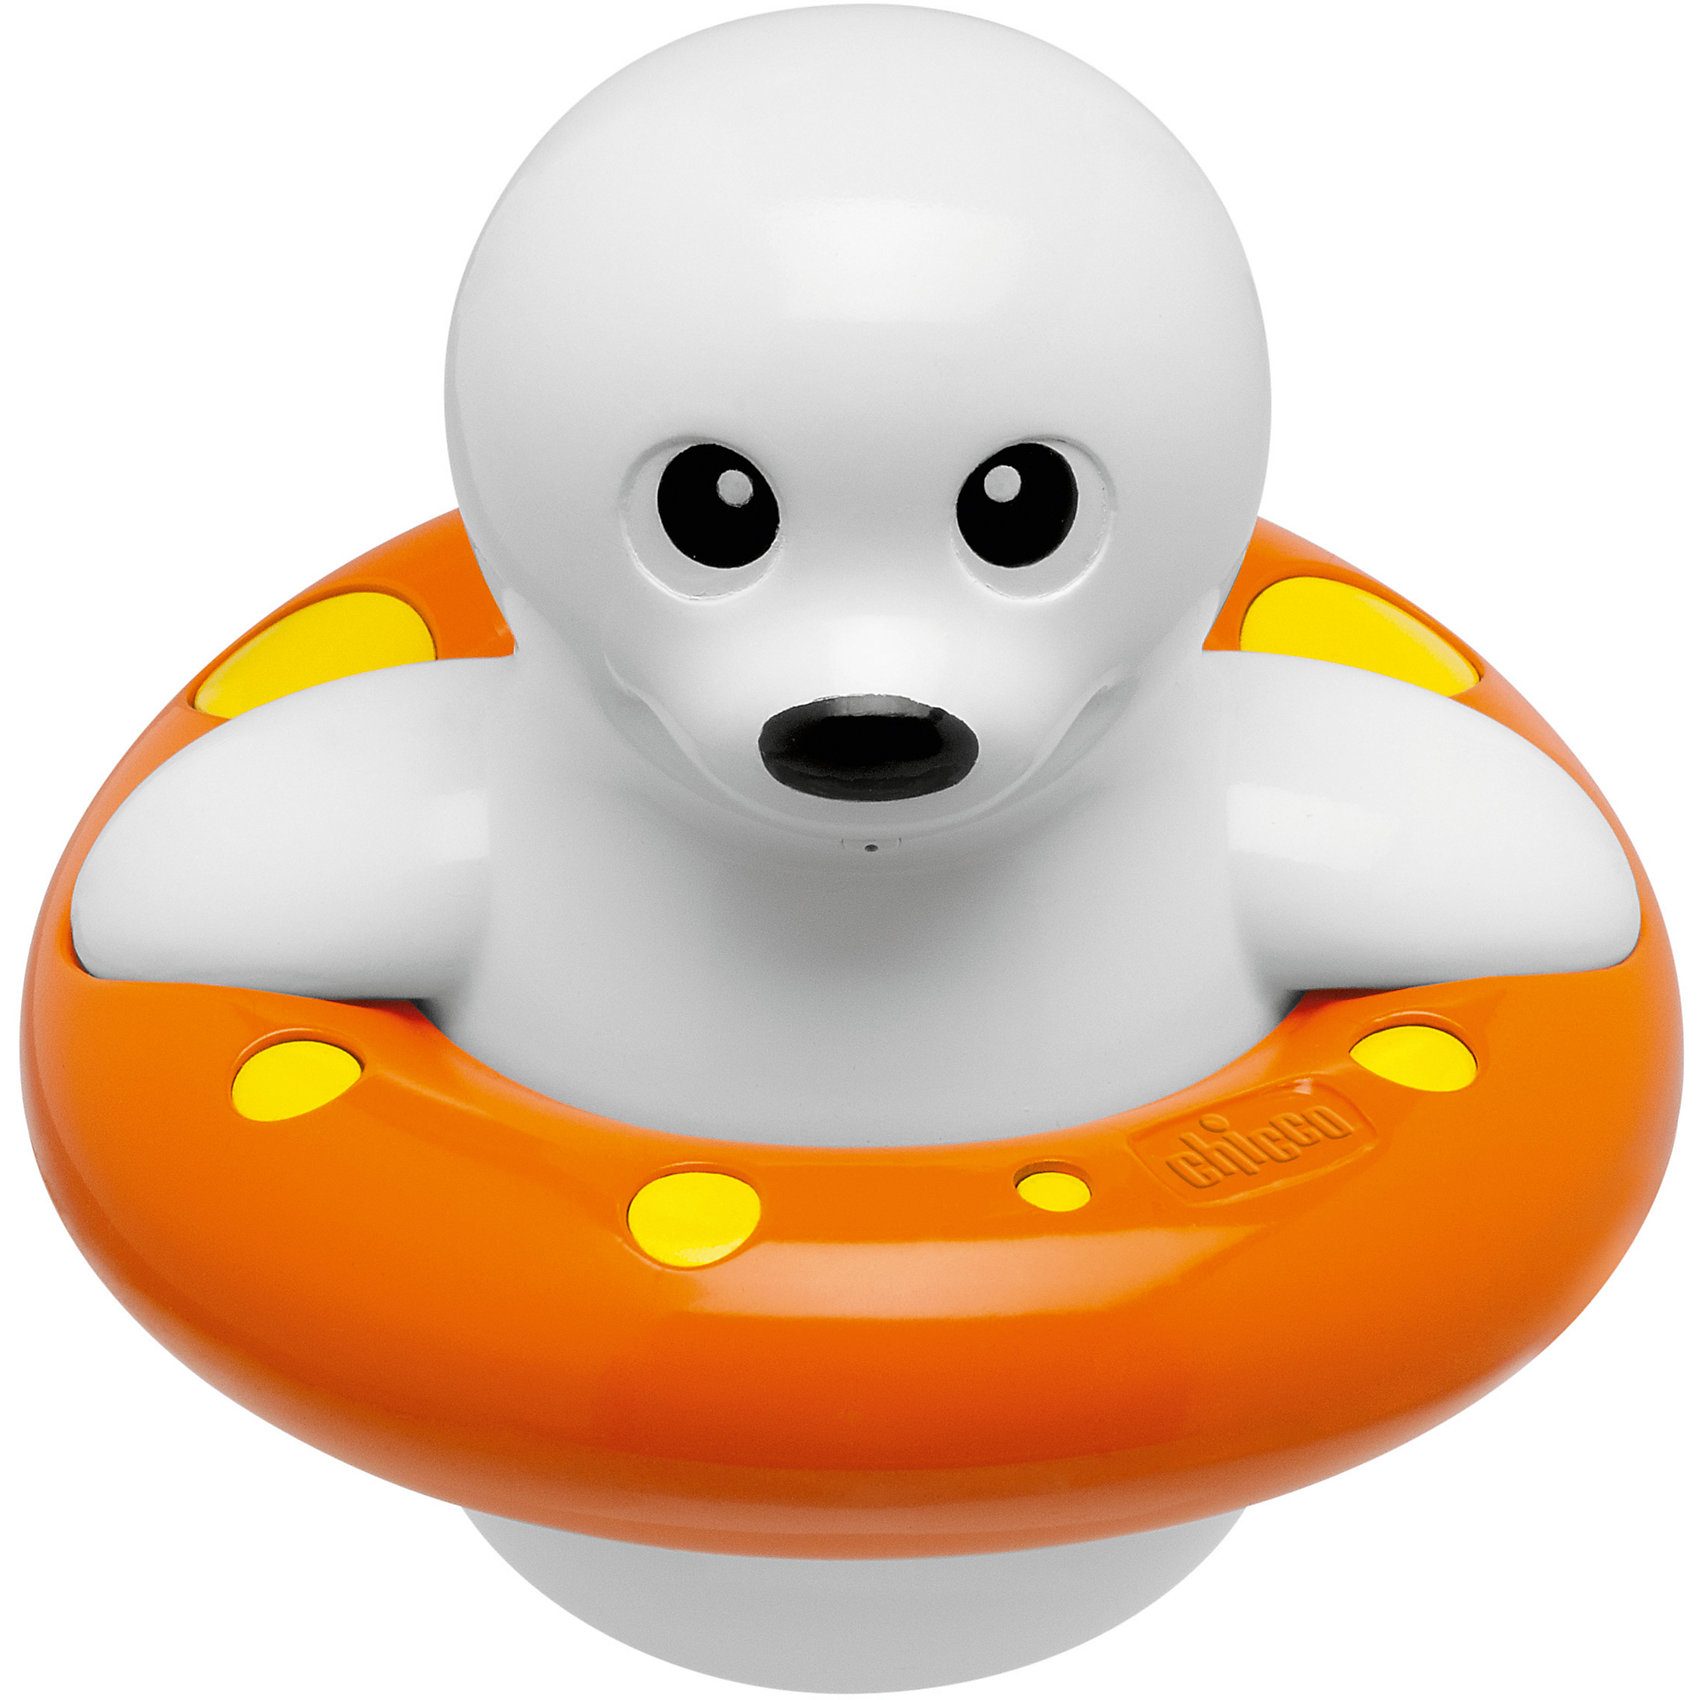 CHICCO Игрушка для ванны Морской котик, Chicco игрушка музыкальная chicco утёнок 6995 3